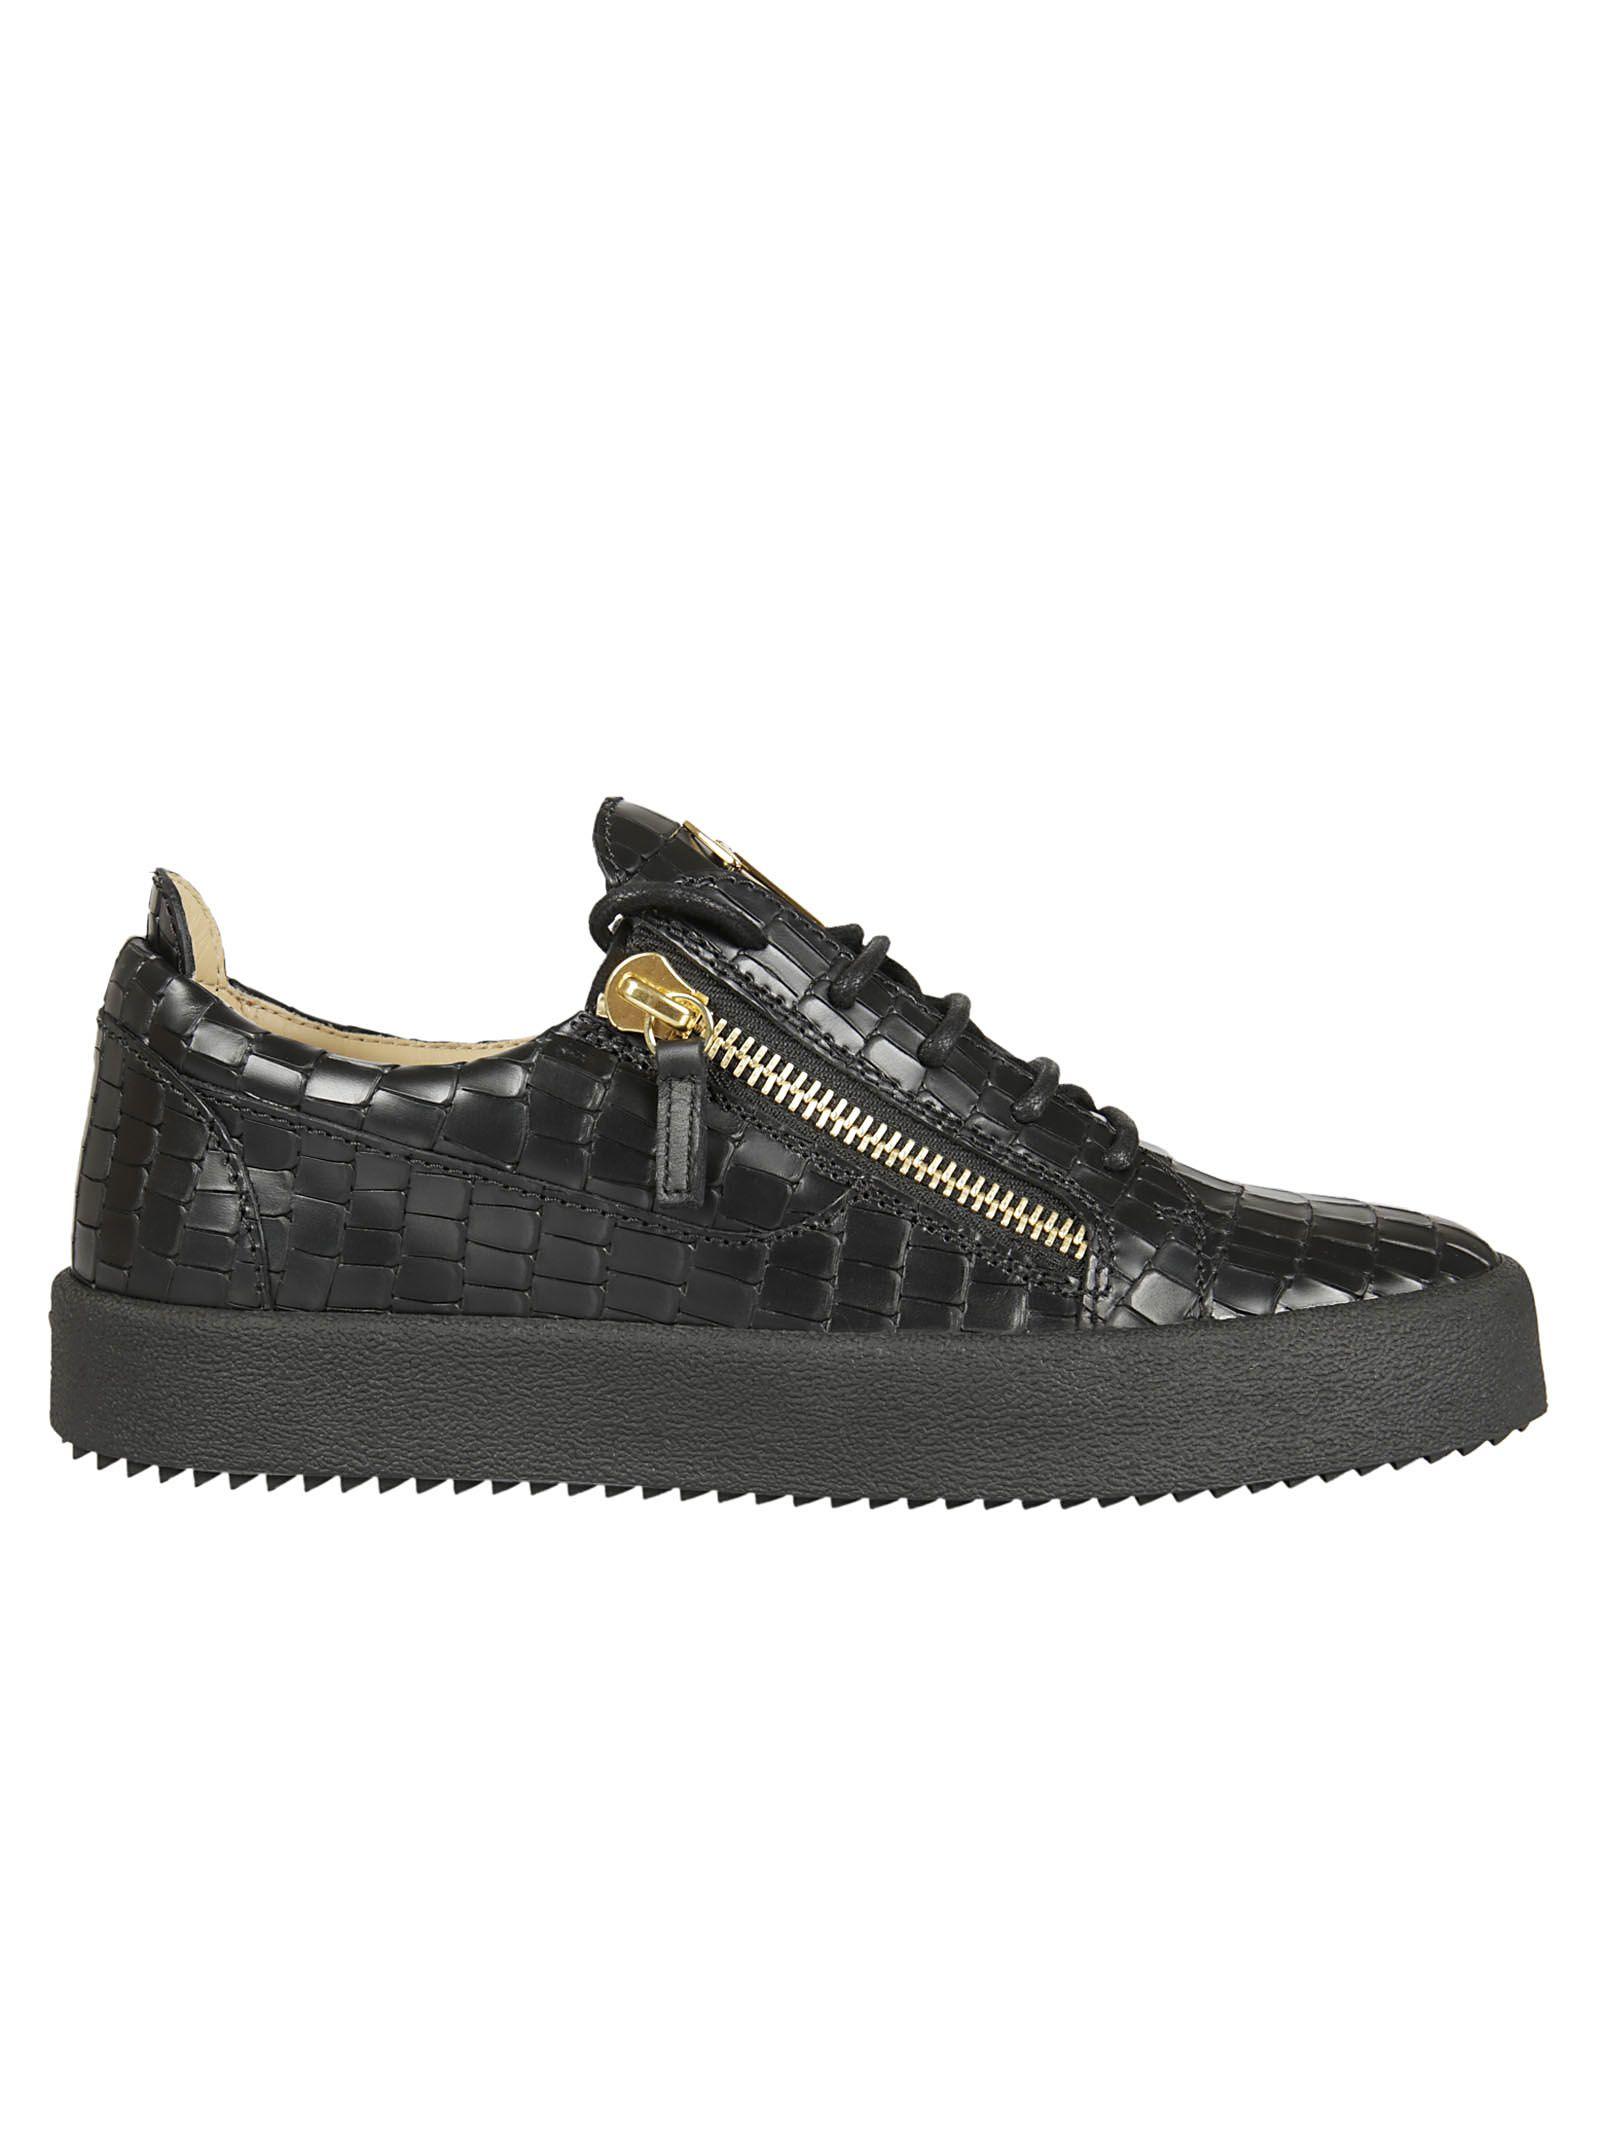 Giuseppe Zanotti Frankie Sneakers